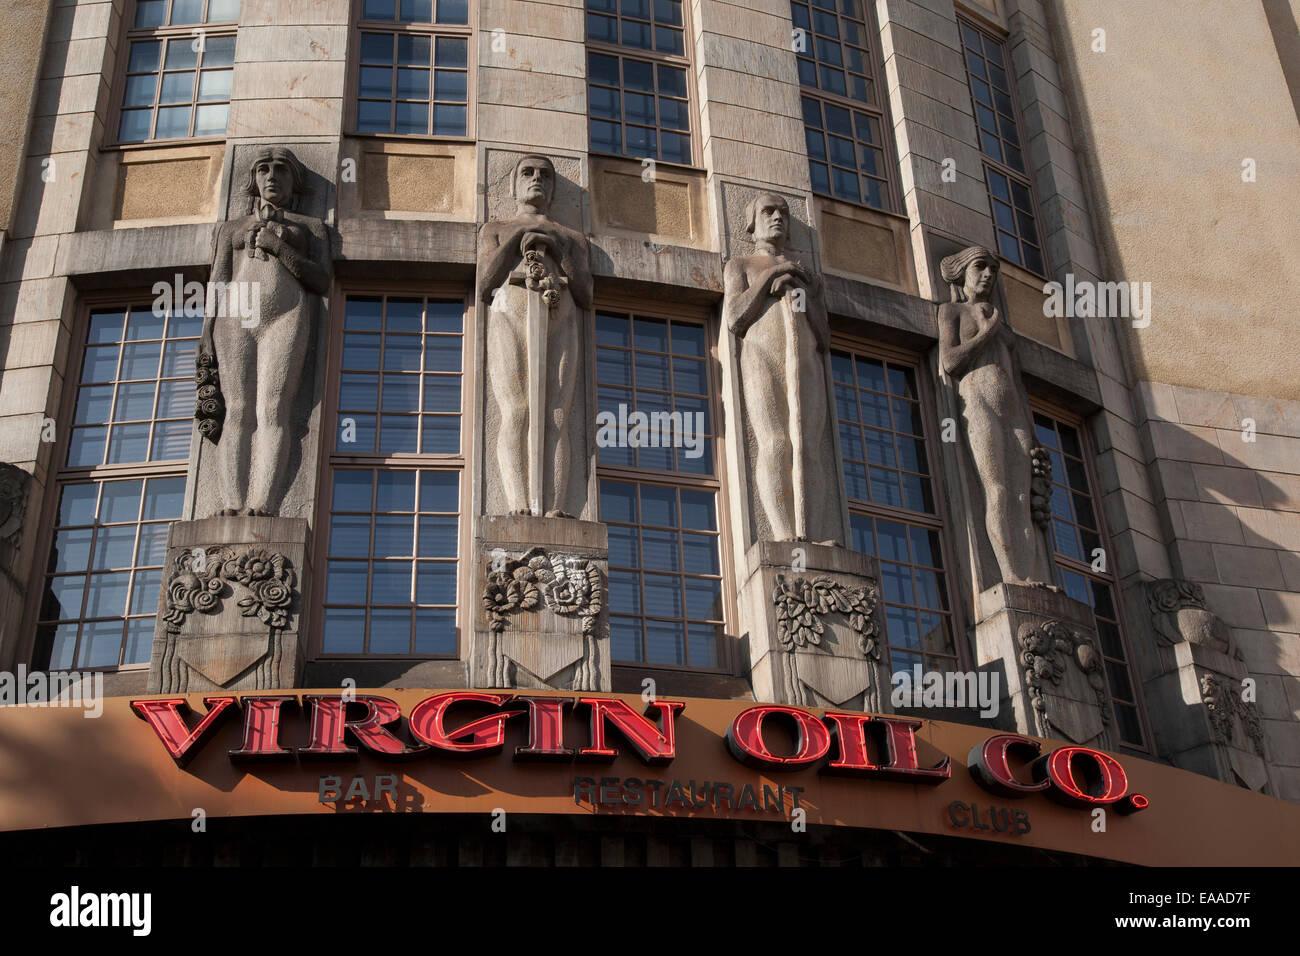 Art deco design of virgin oil company bar restaurant and club